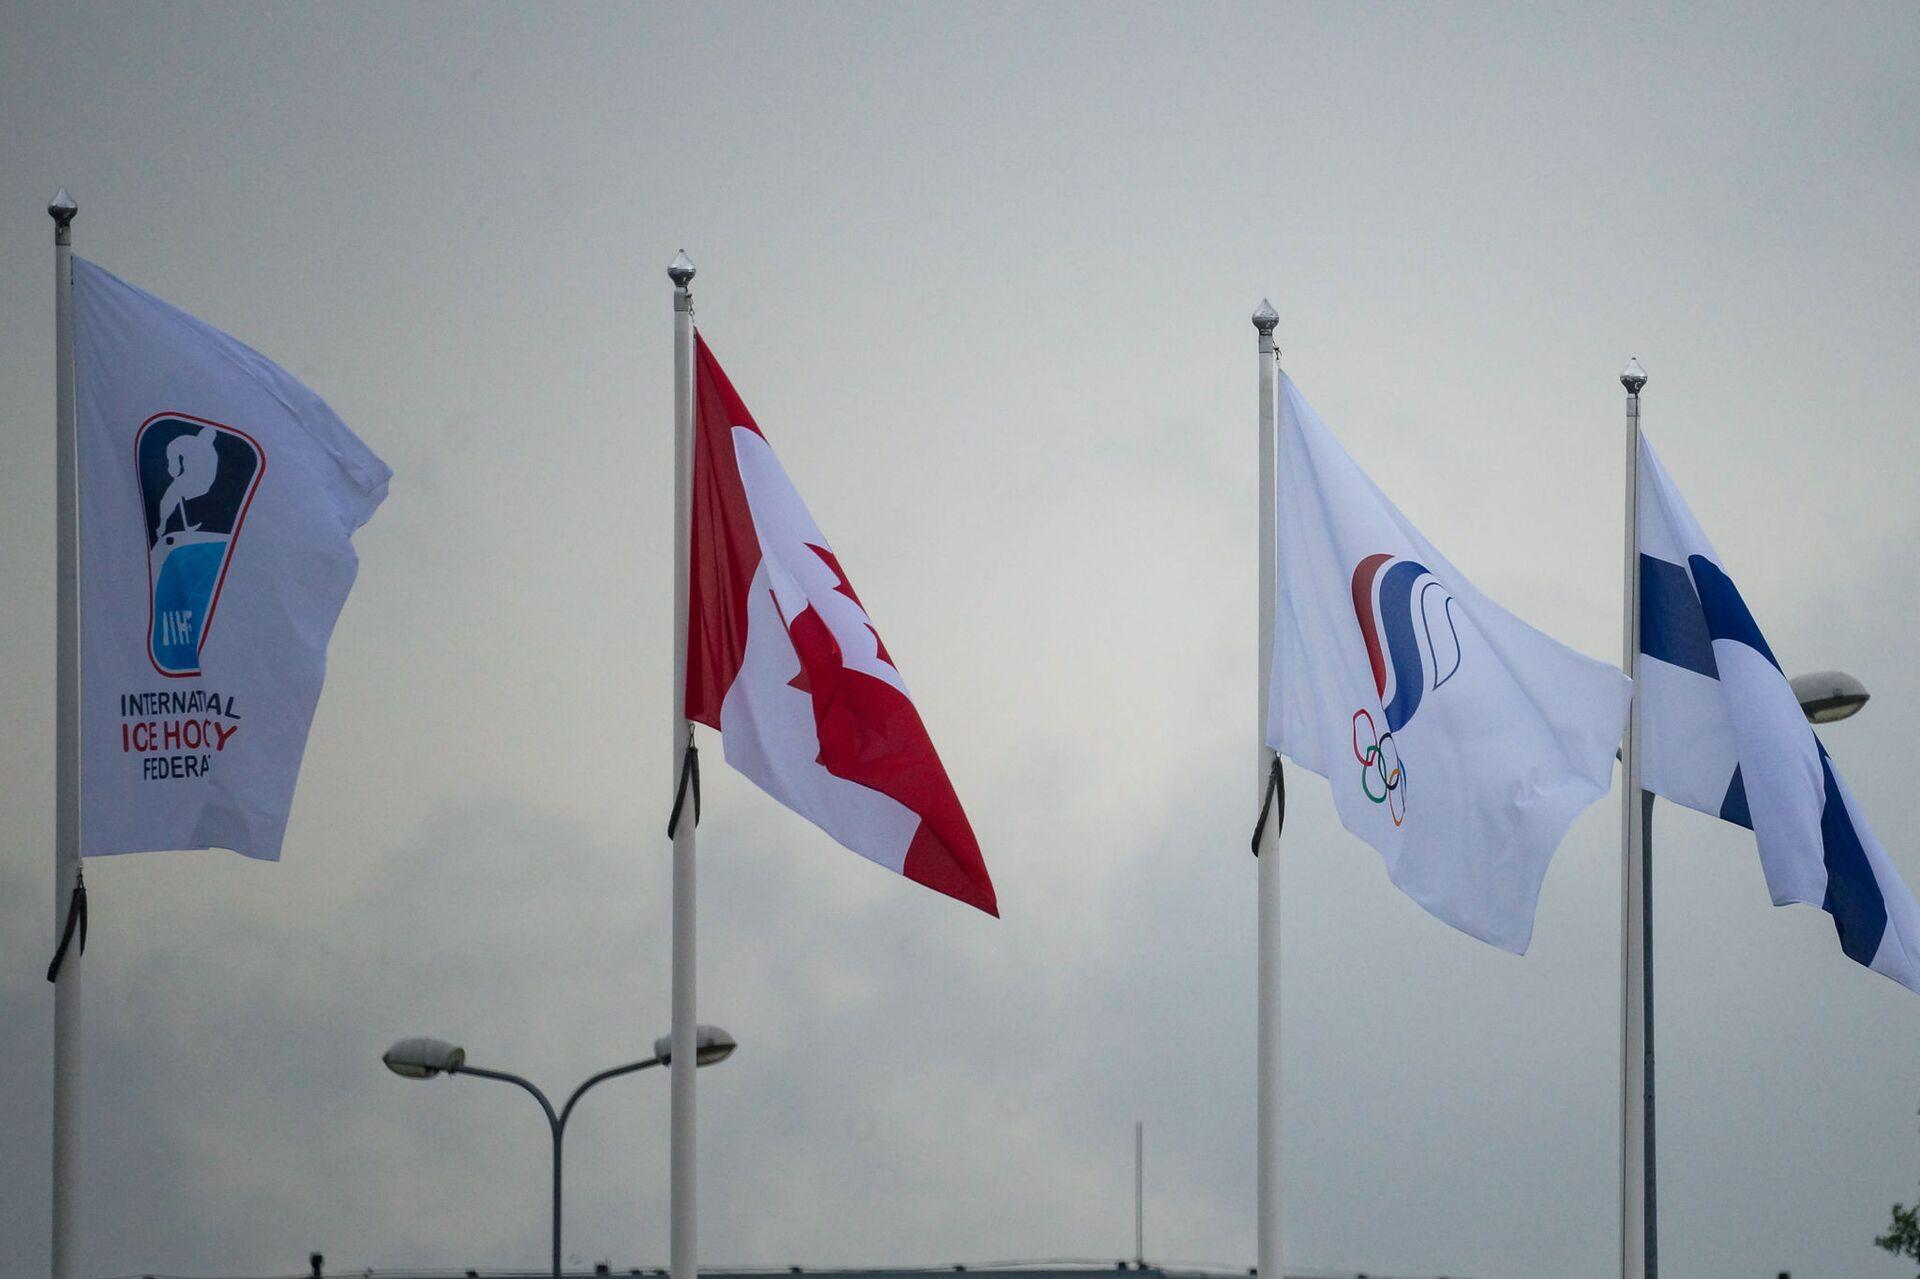 Флаг Олимпийского комитета России среди флагов участников Чемпионата мира - 2021 в Риге - Sputnik Латвия, 1920, 01.06.2021